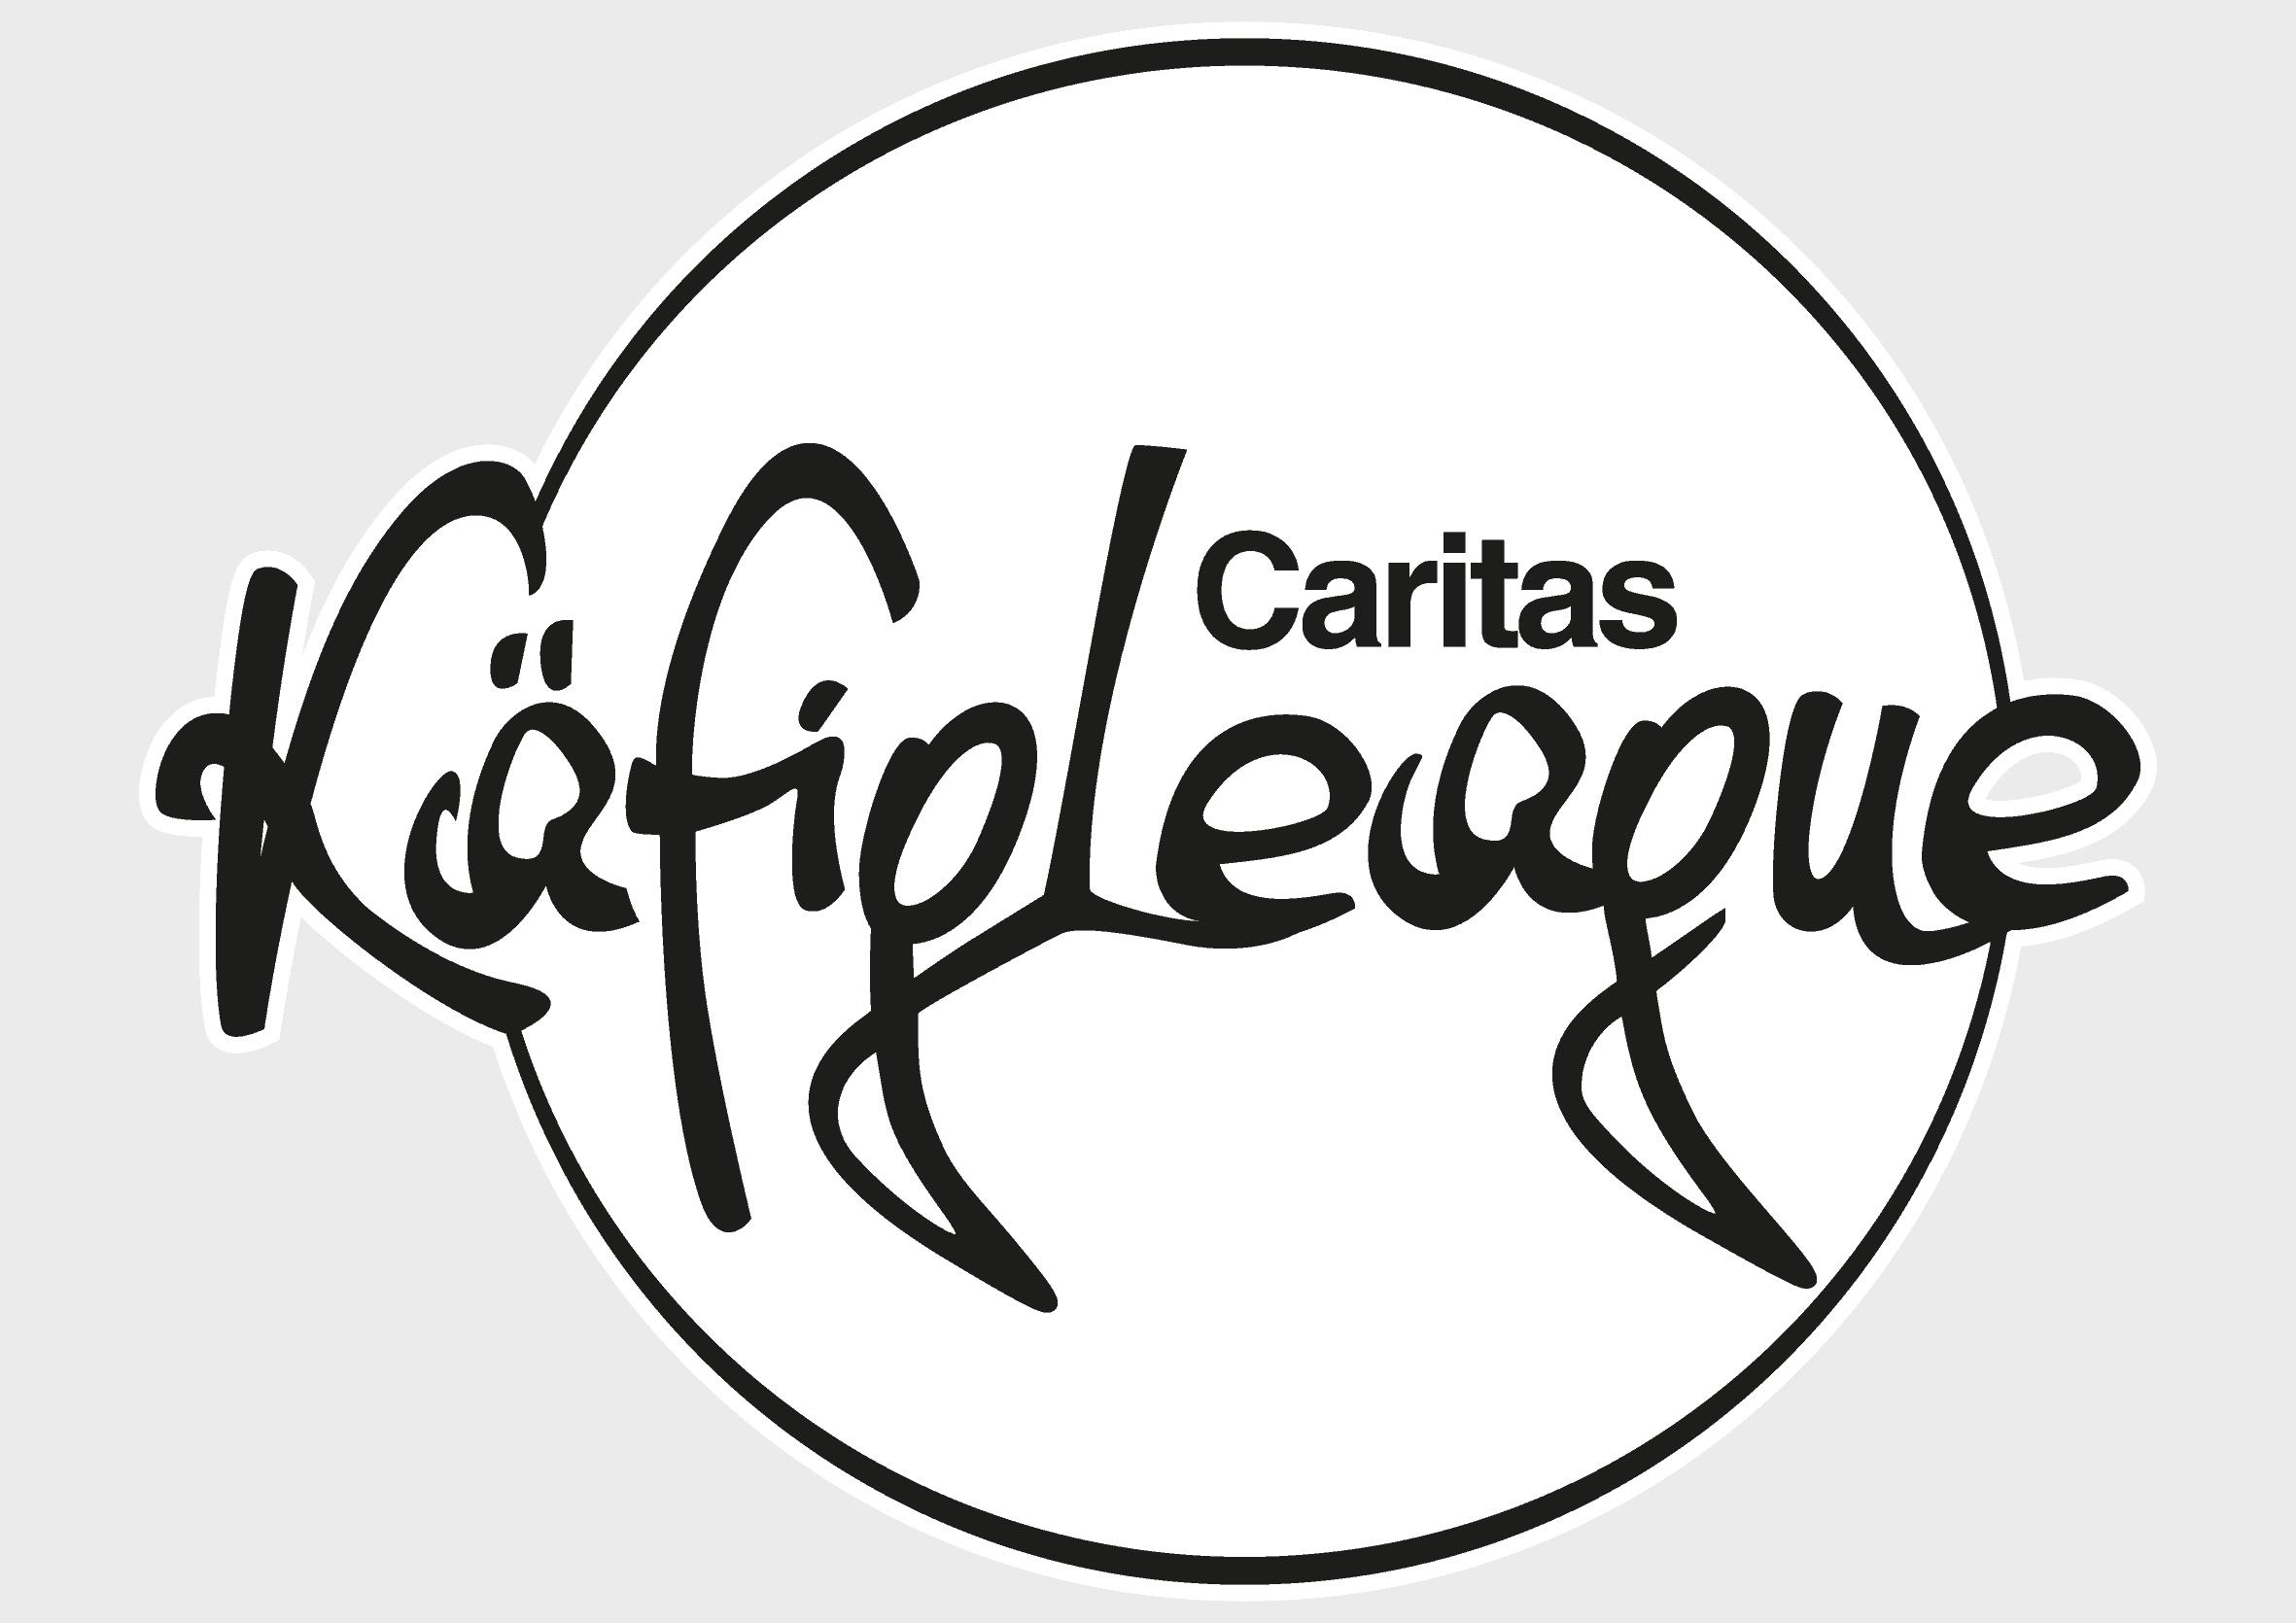 Käfig League - Caritas Wien